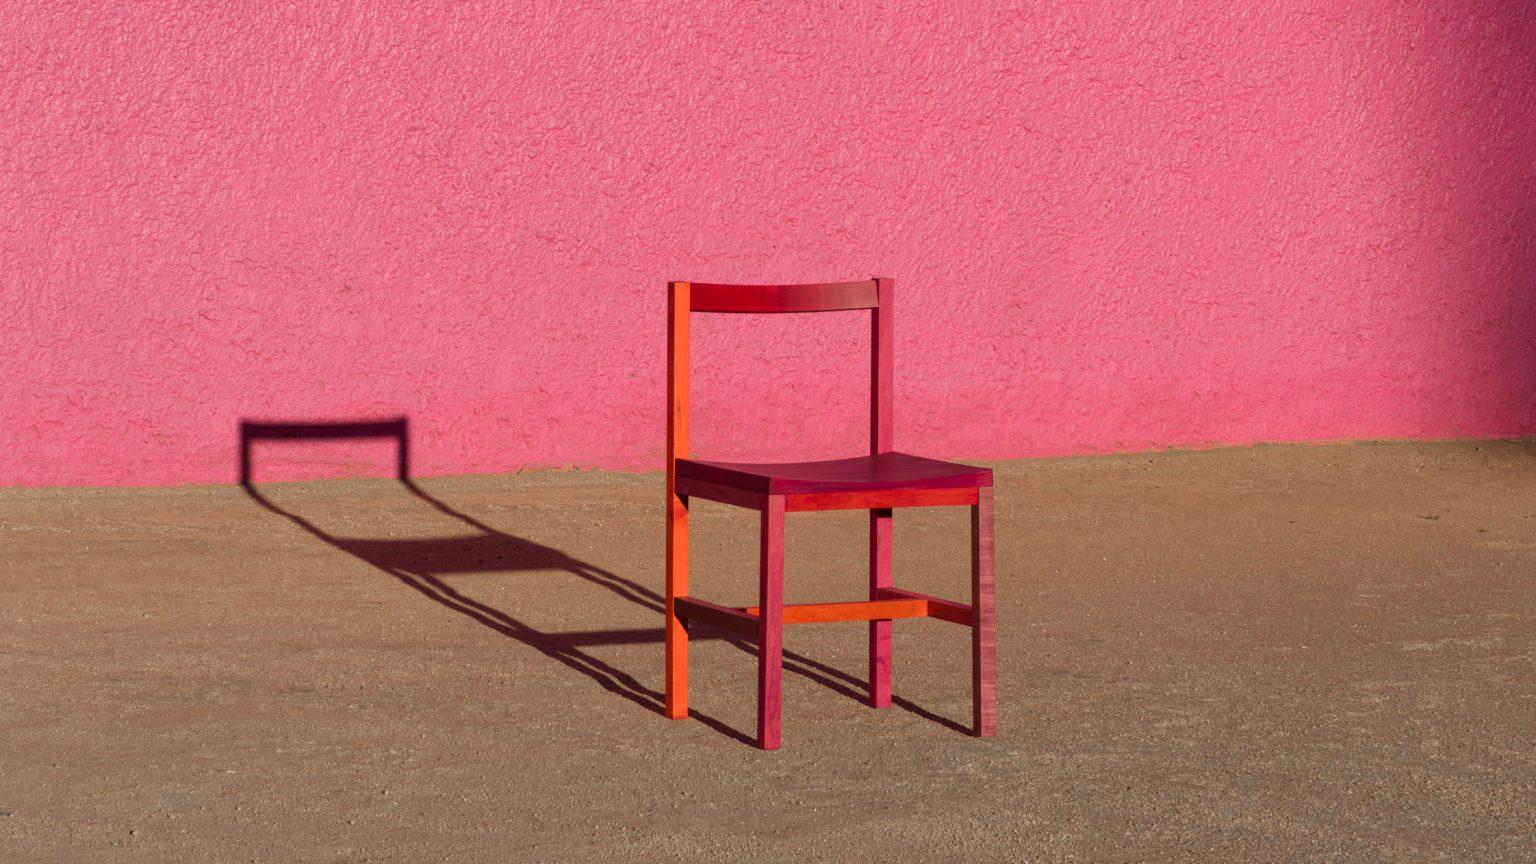 moises-hernandez-grana-chairs-design_dezeen_2364_col_2-1536x864